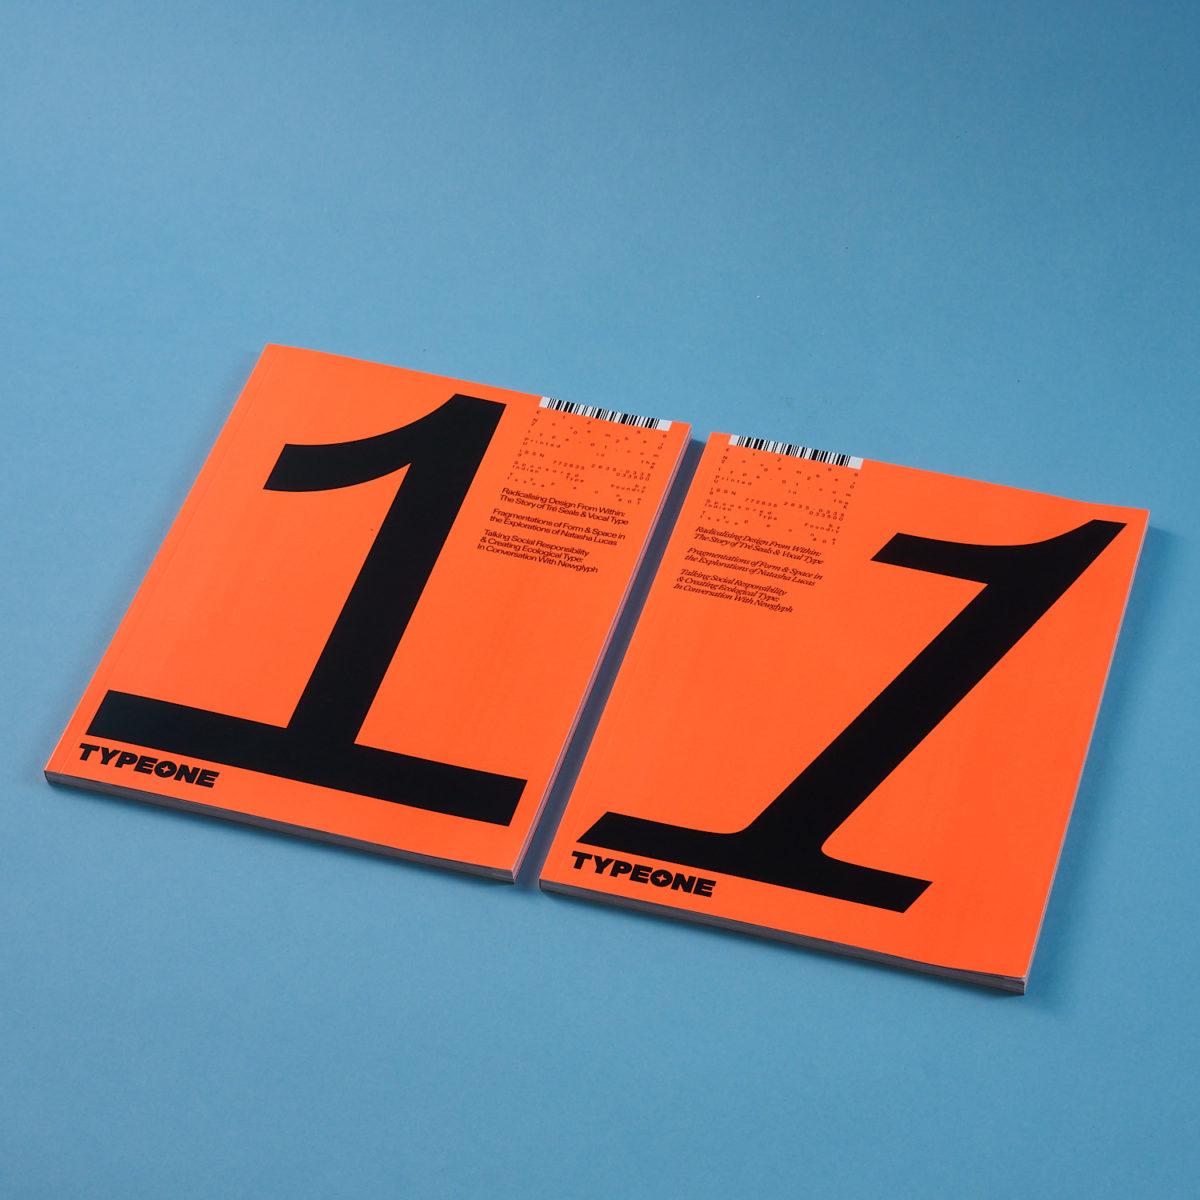 TYPEONE Magazine cover